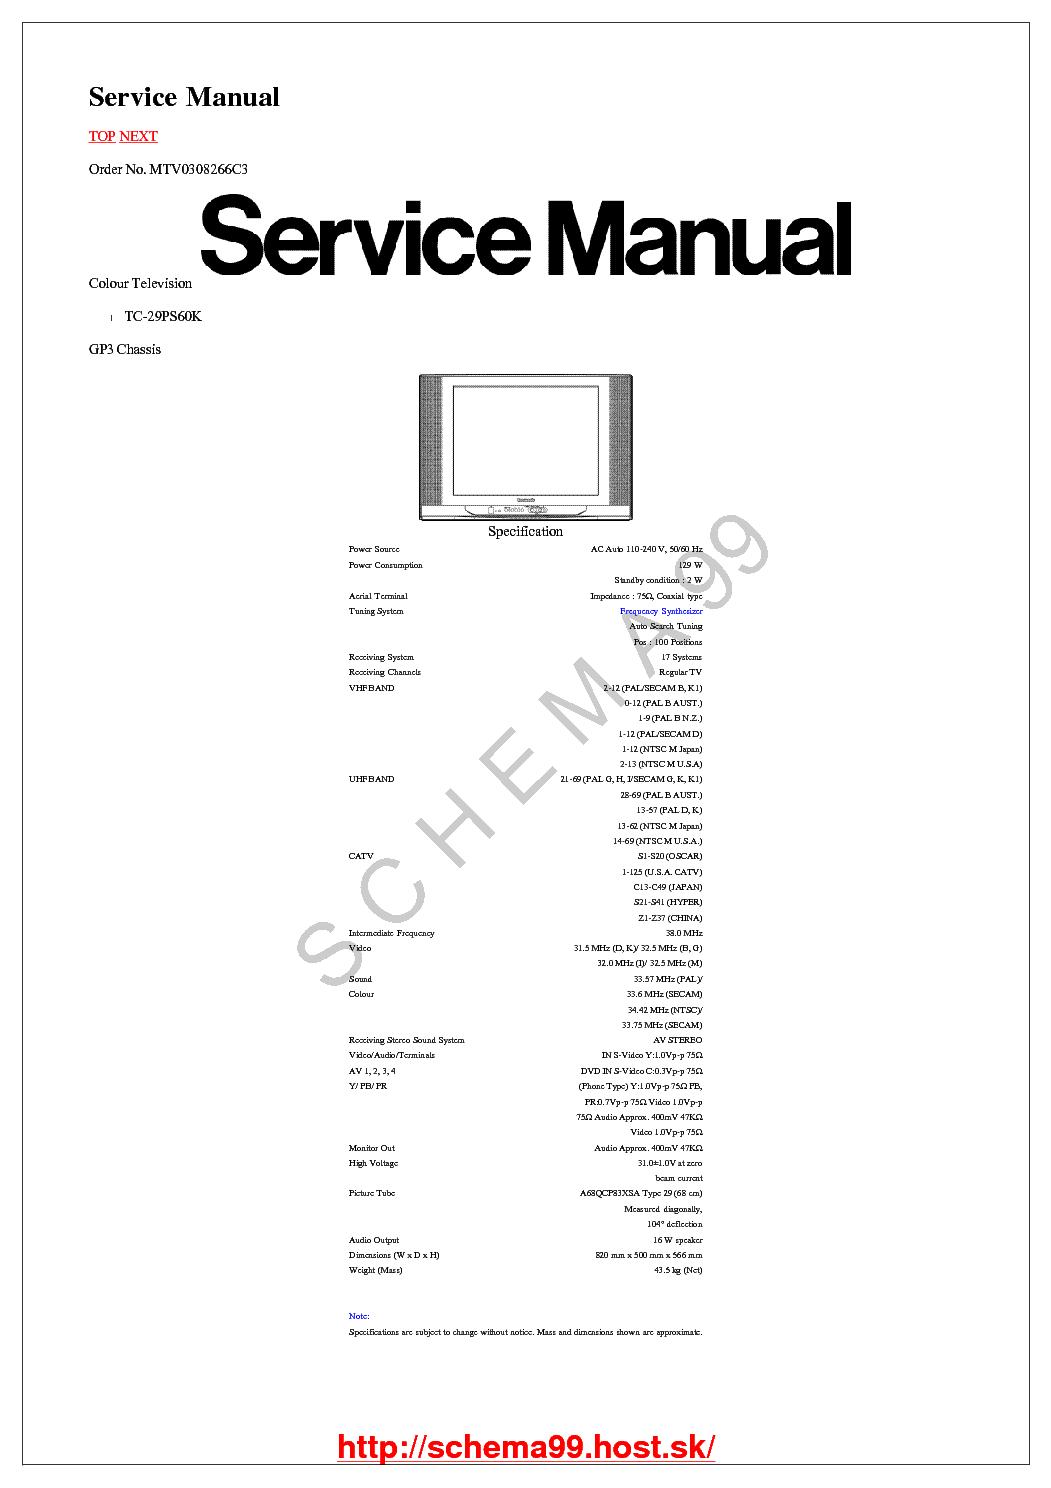 PANASONIC CH GP3 TC-29PS60K SM Service Manual download